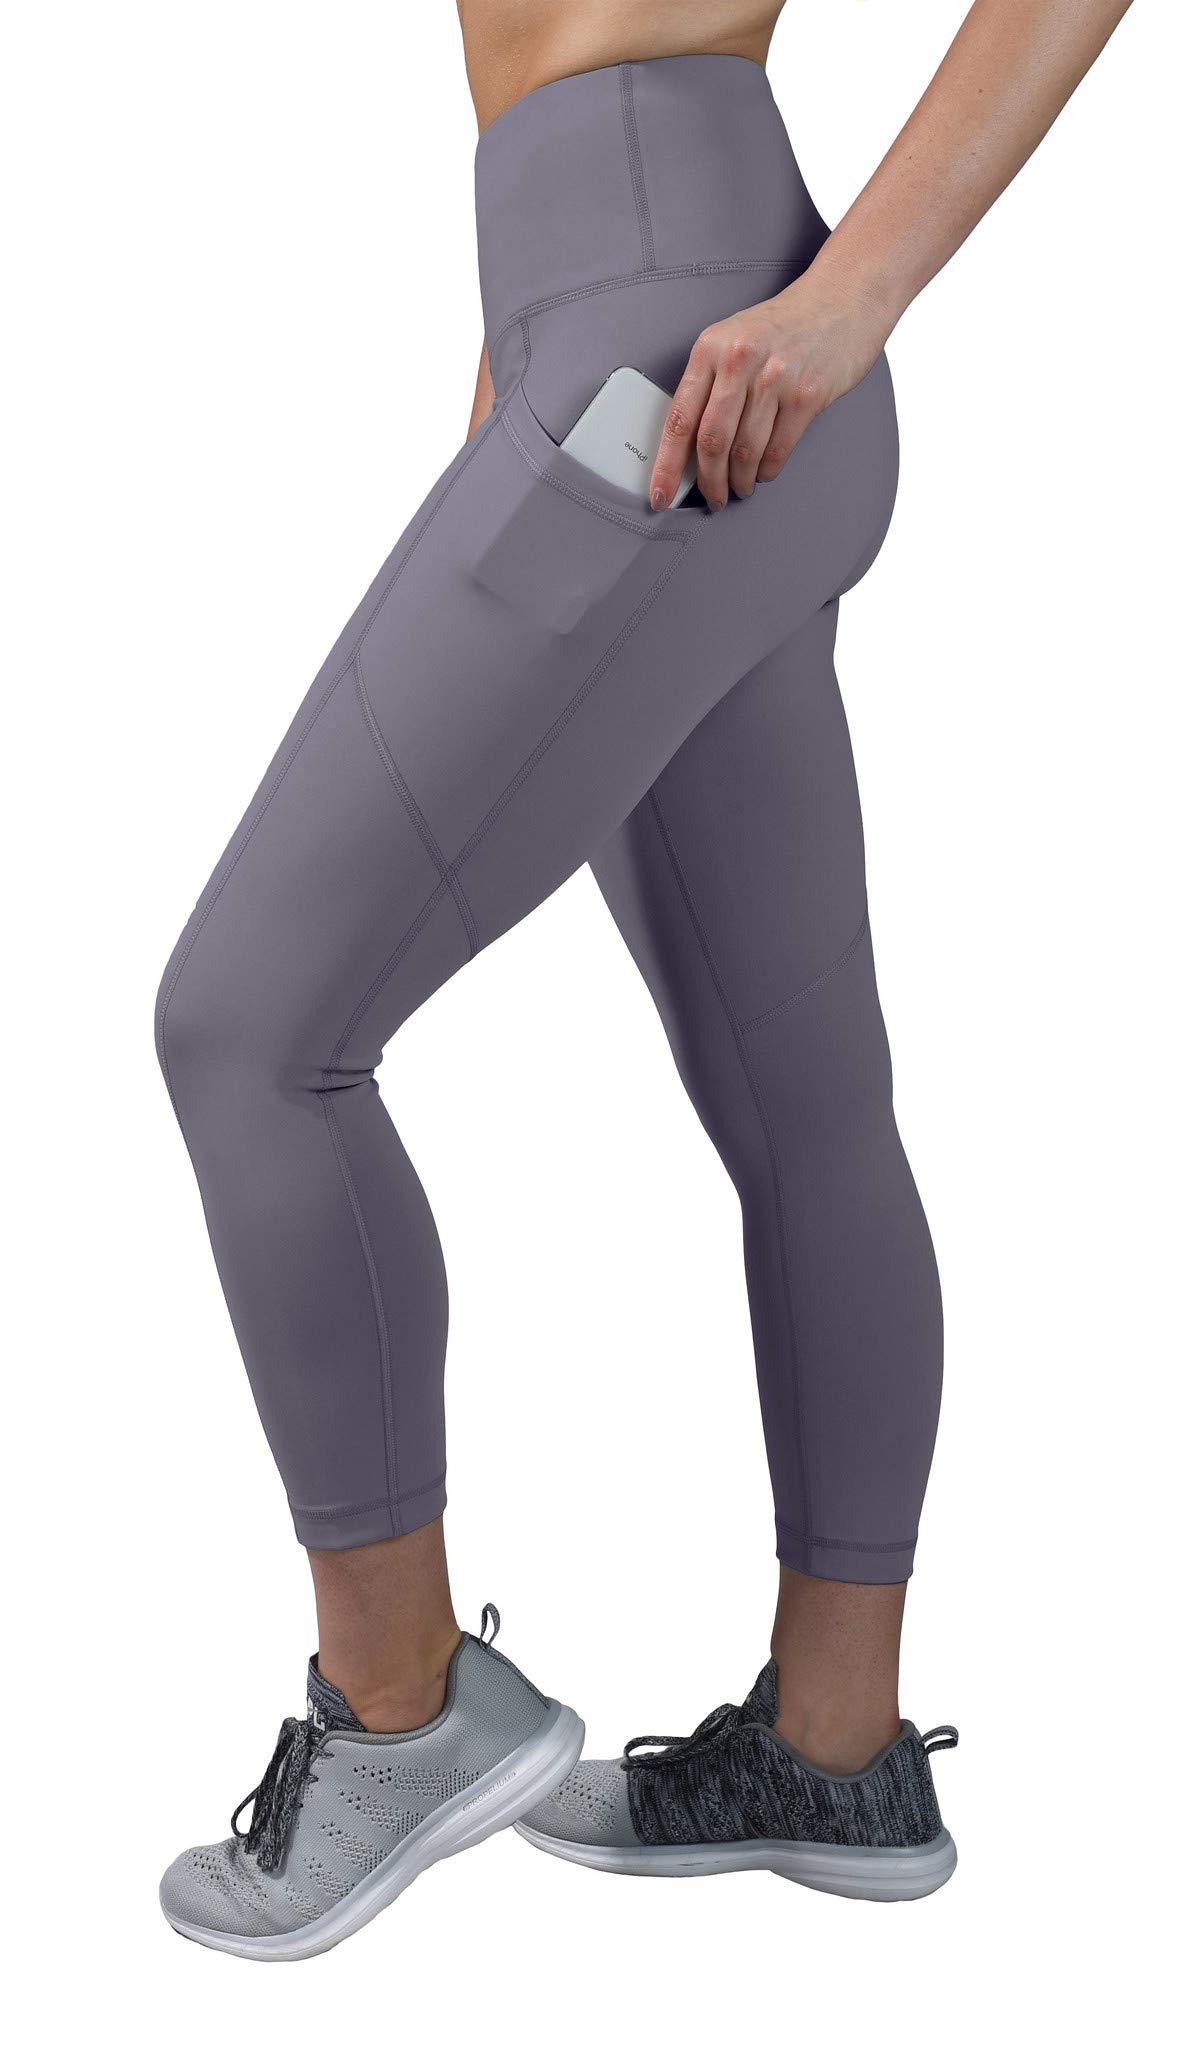 90 Degree By Reflex High Waist Squat Proof Yoga Capri Leggings with Side Phone Pockets - Grey Opal - Medium by 90 Degree By Reflex